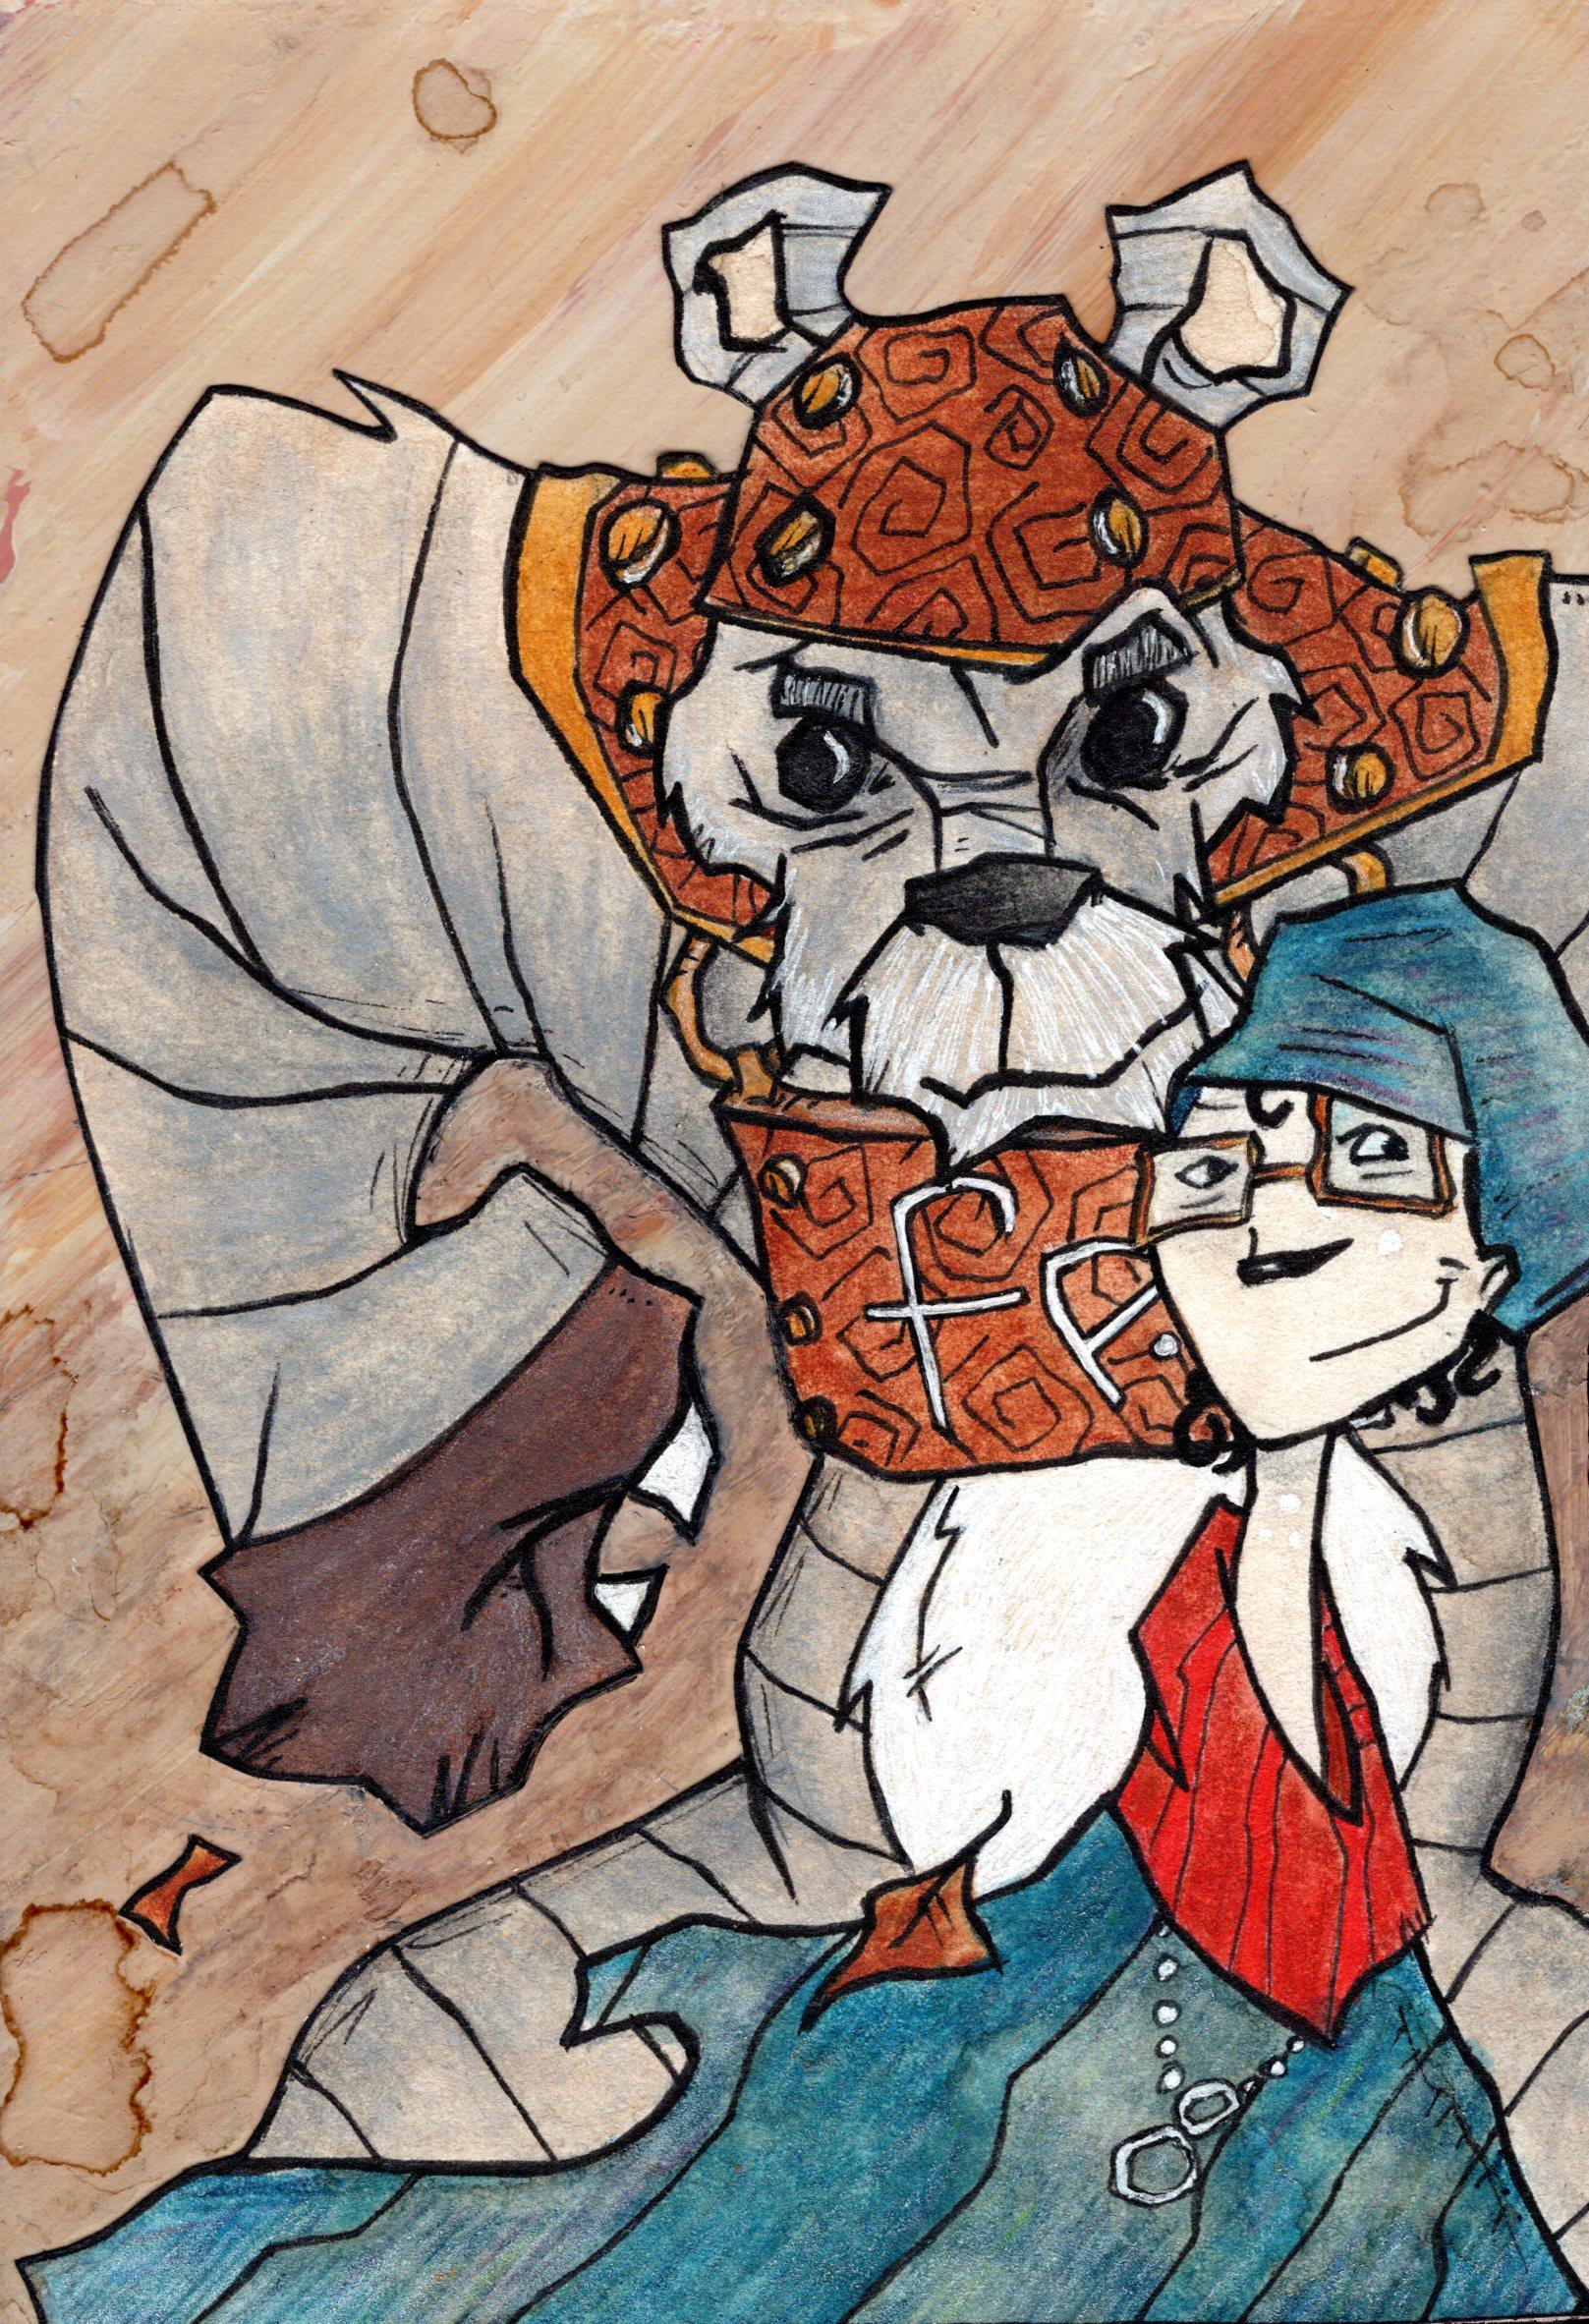 Iron Teddybear and Melanoma Girl